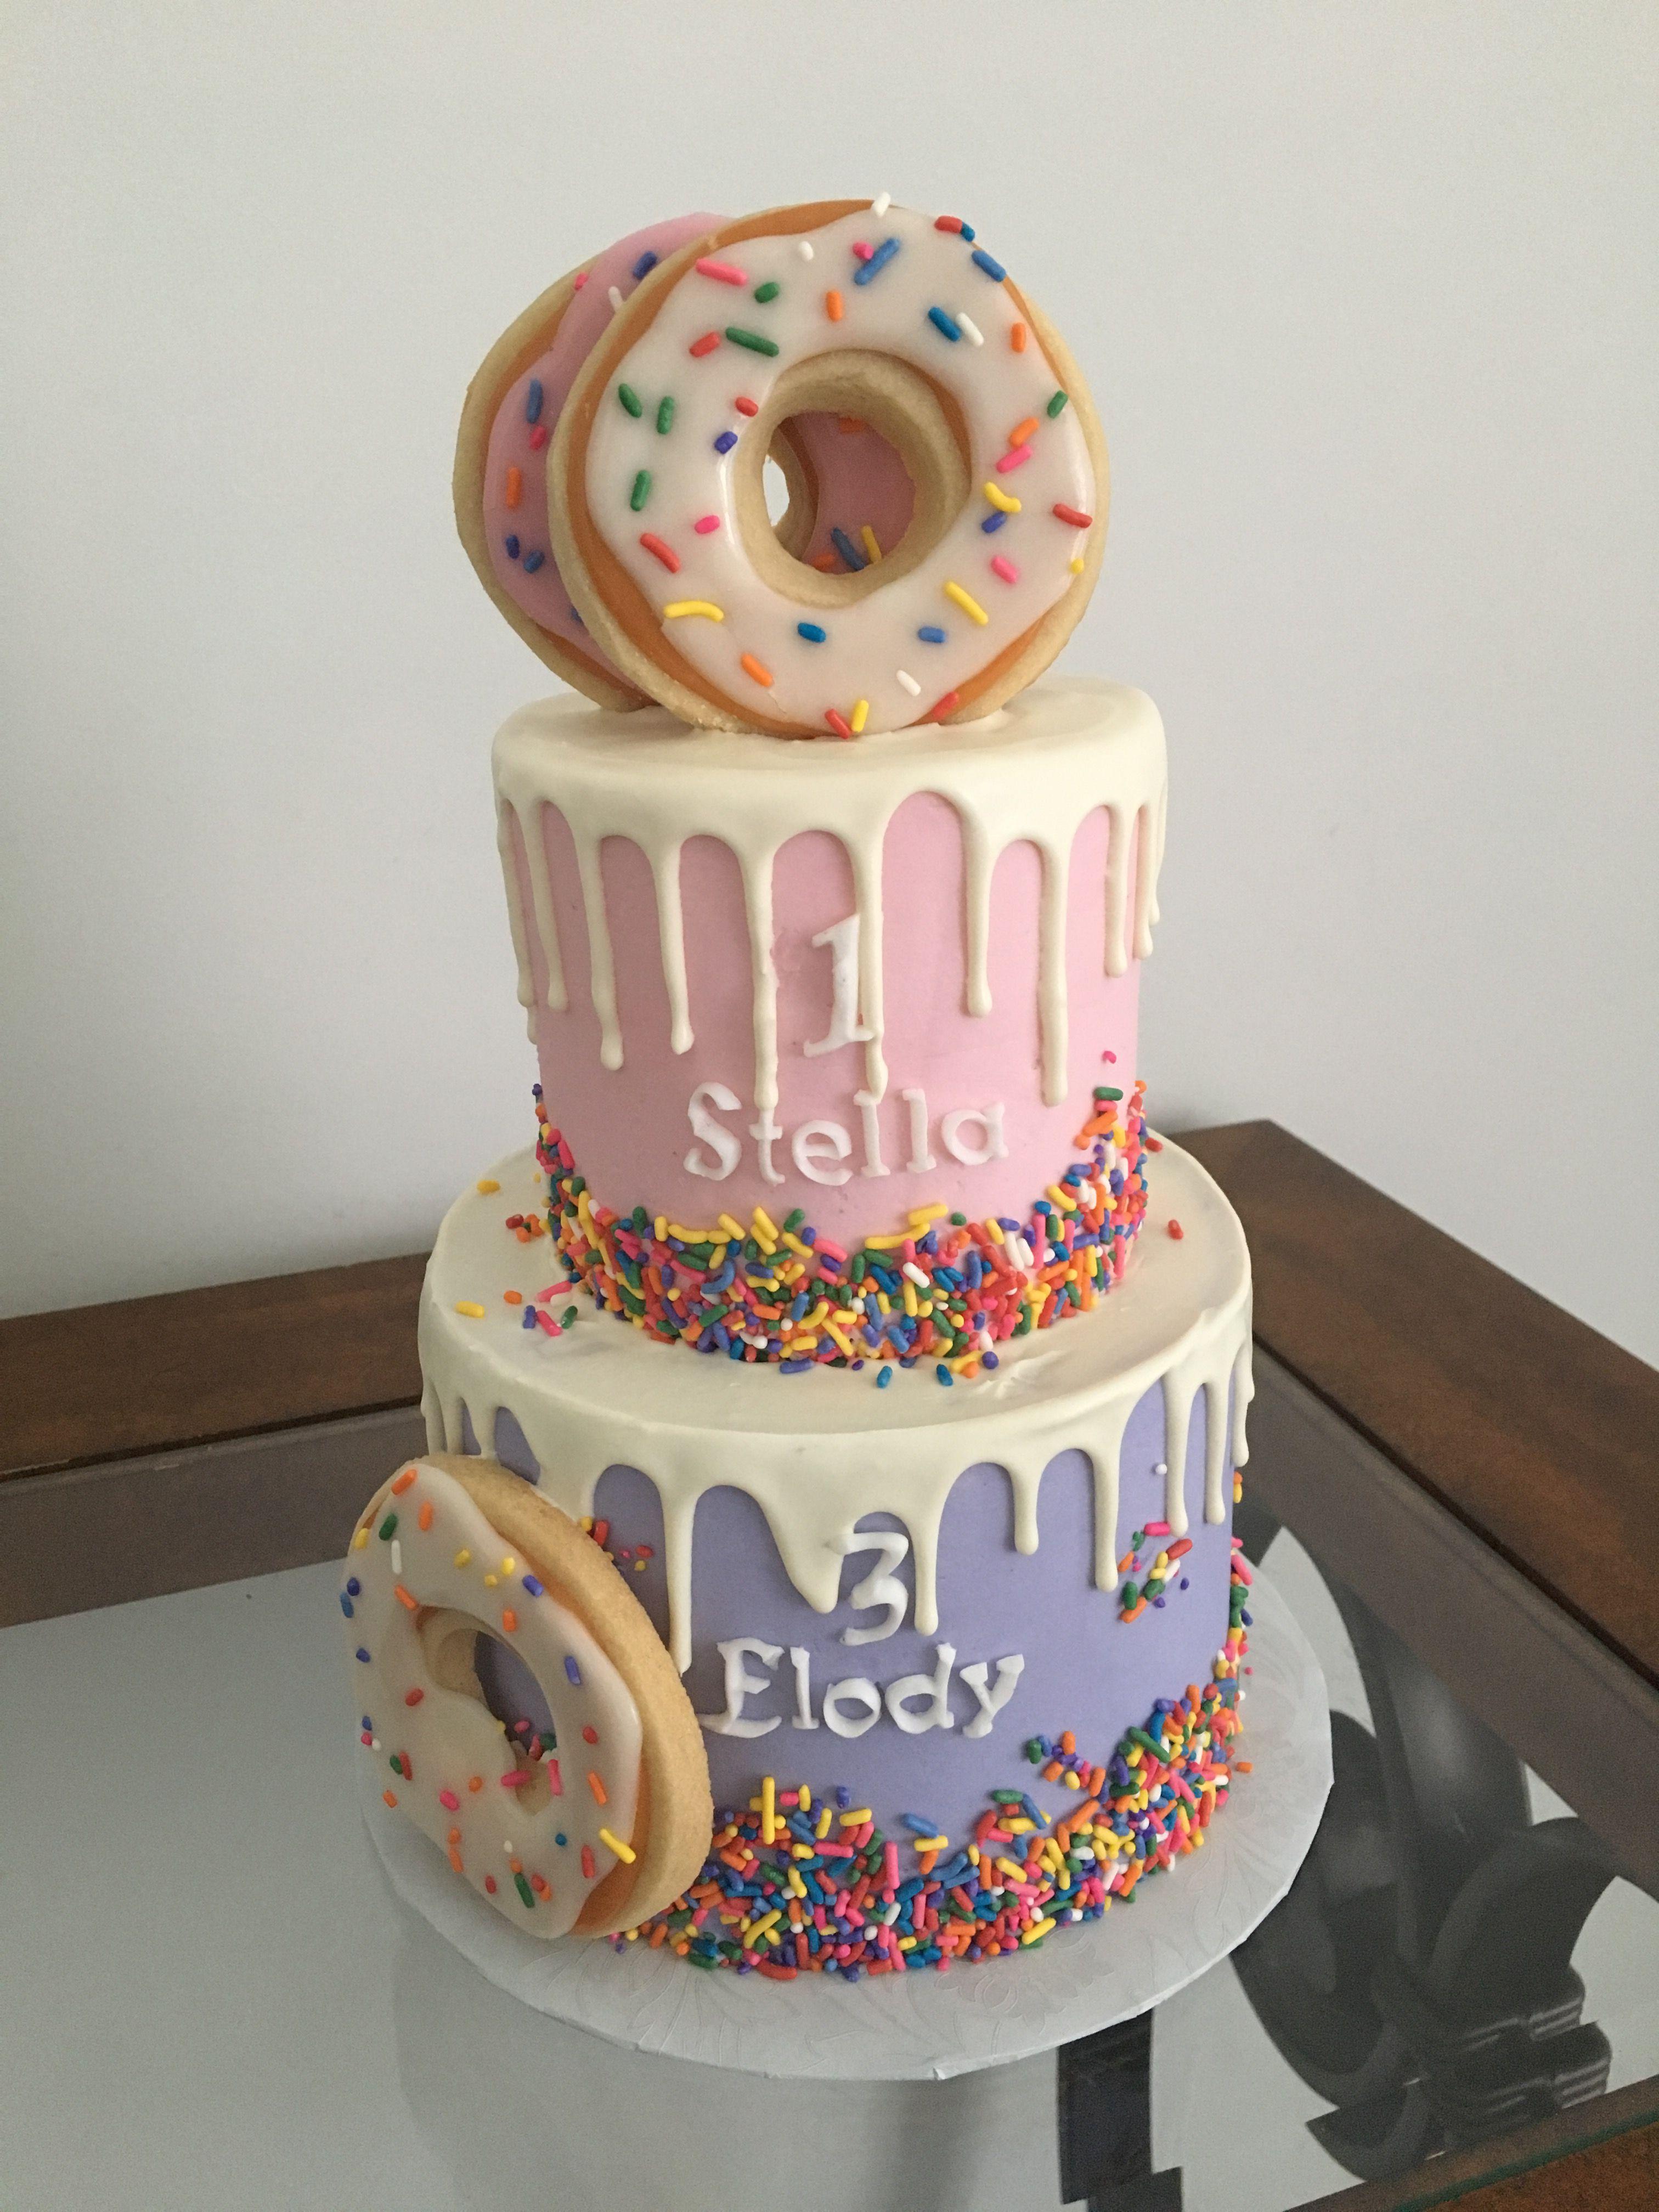 Incredible Donut Grow Up Birthday Cake With Images Donut Birthday Cake Funny Birthday Cards Online Benoljebrpdamsfinfo